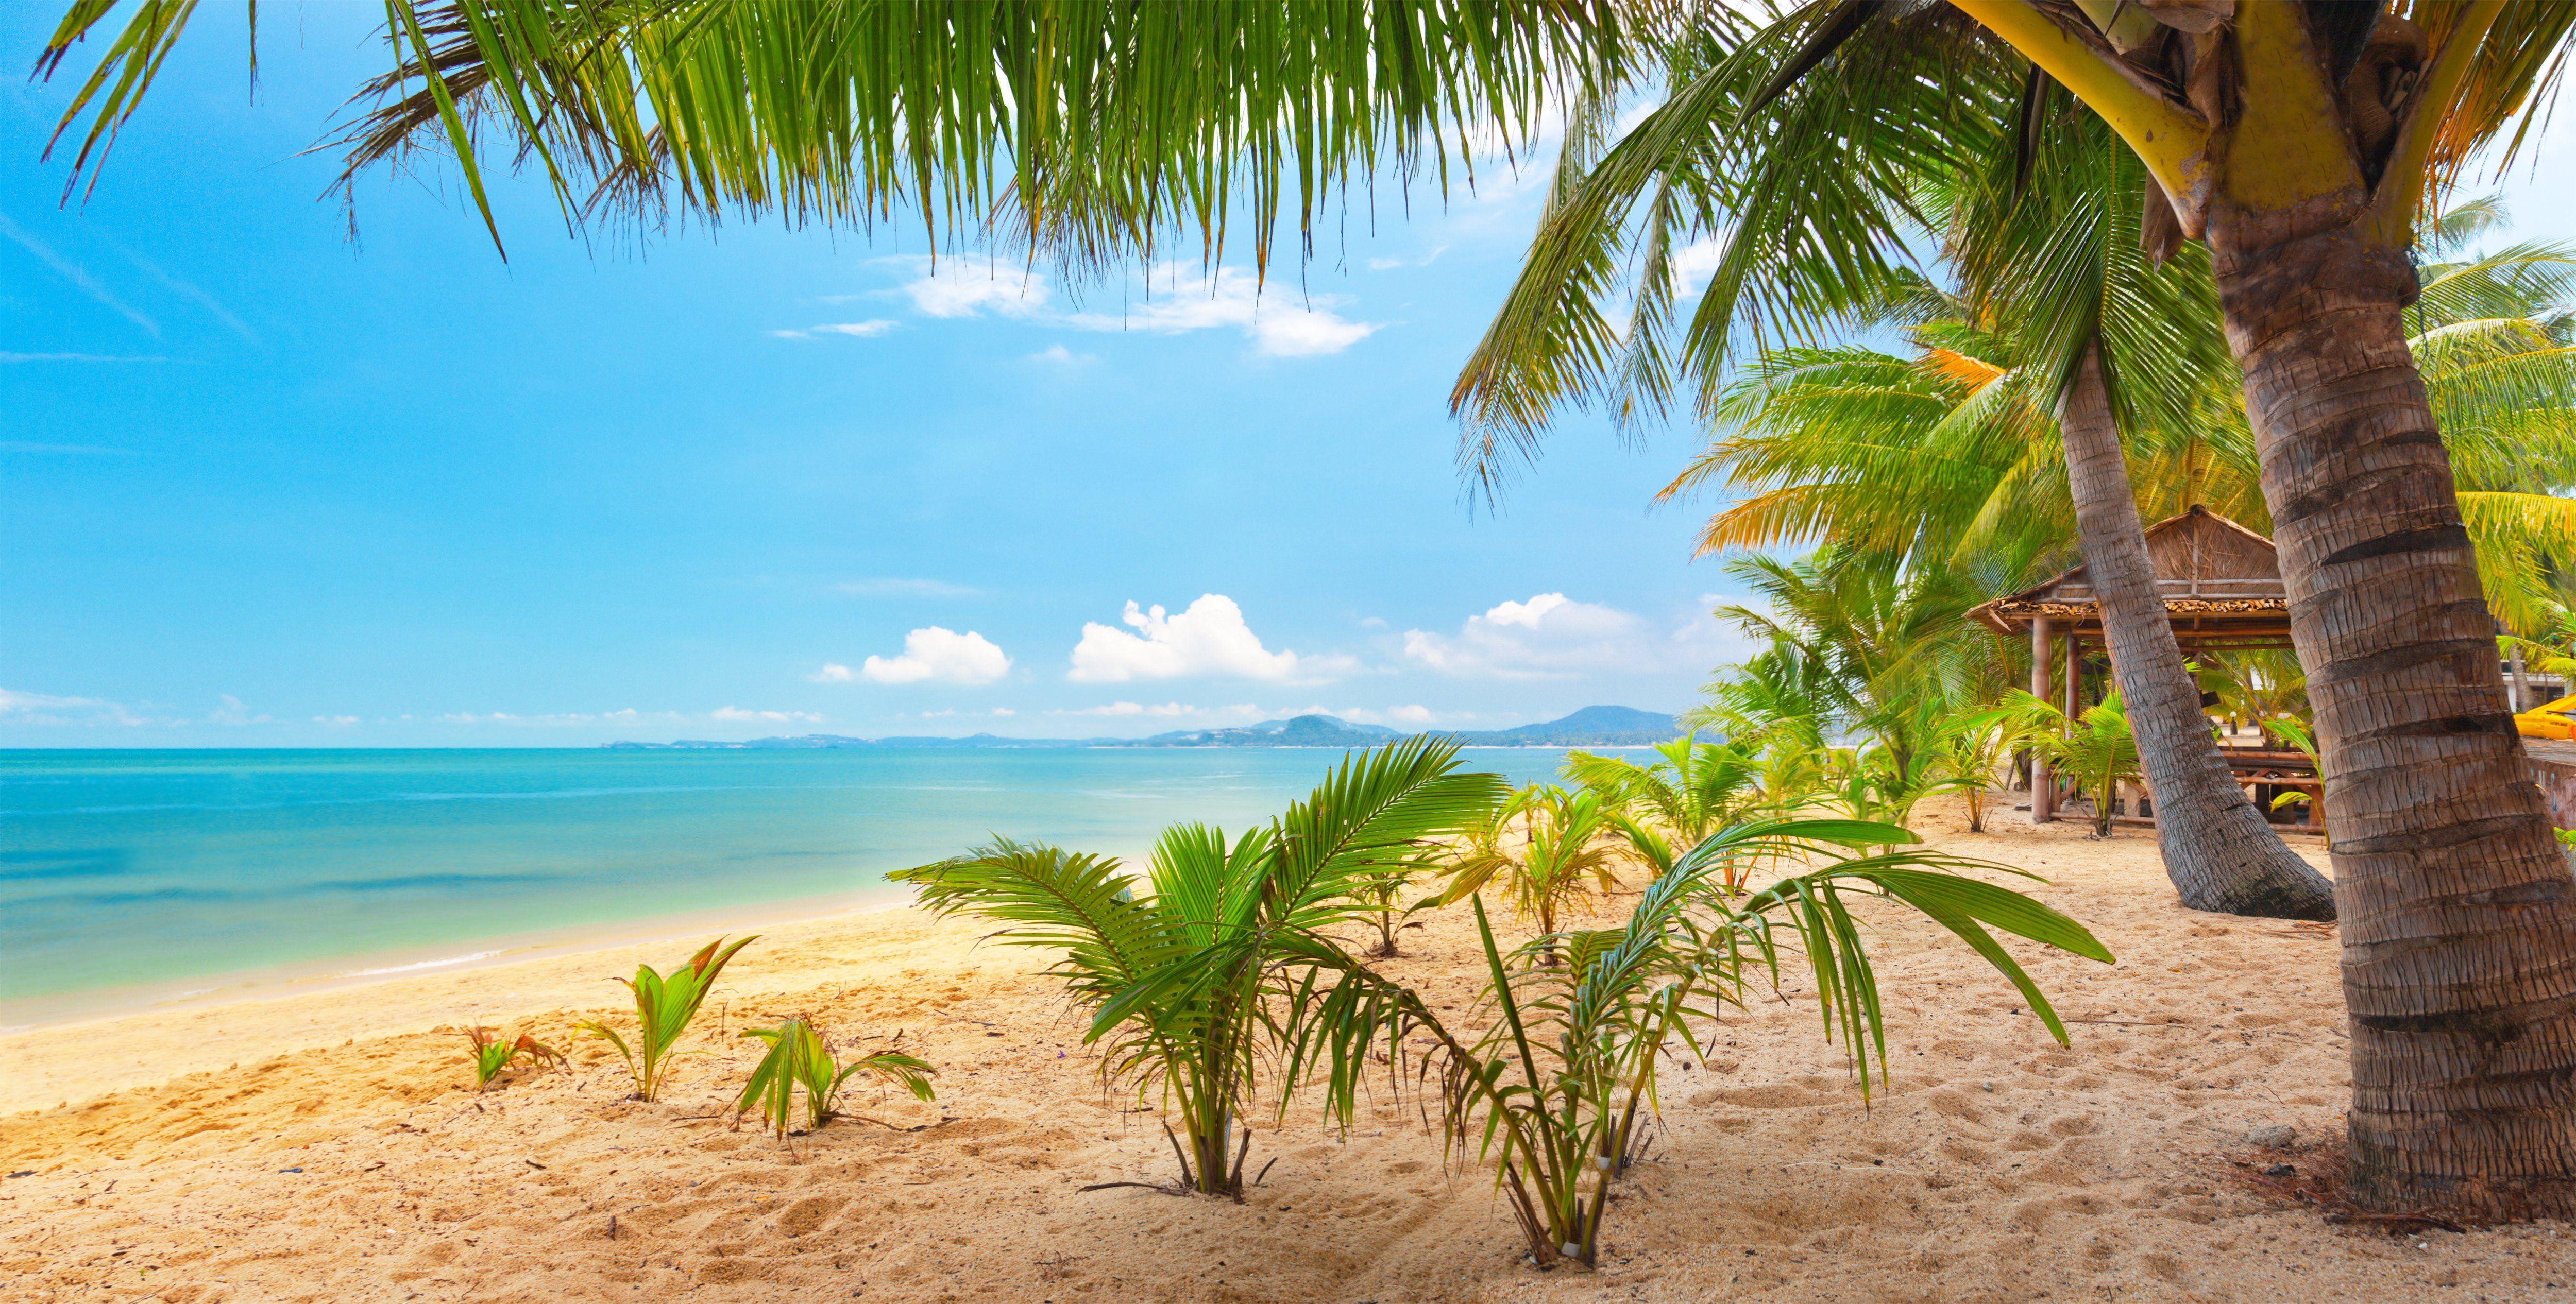 Beautiful Landscape Nature Palm Sand Sea Sky Trees Tropical 4k Wallpaper Hdwallpaper Des Beach Wallpaper Hd Nature Wallpapers New Nature Wallpaper Tropical island beach palm sea sand